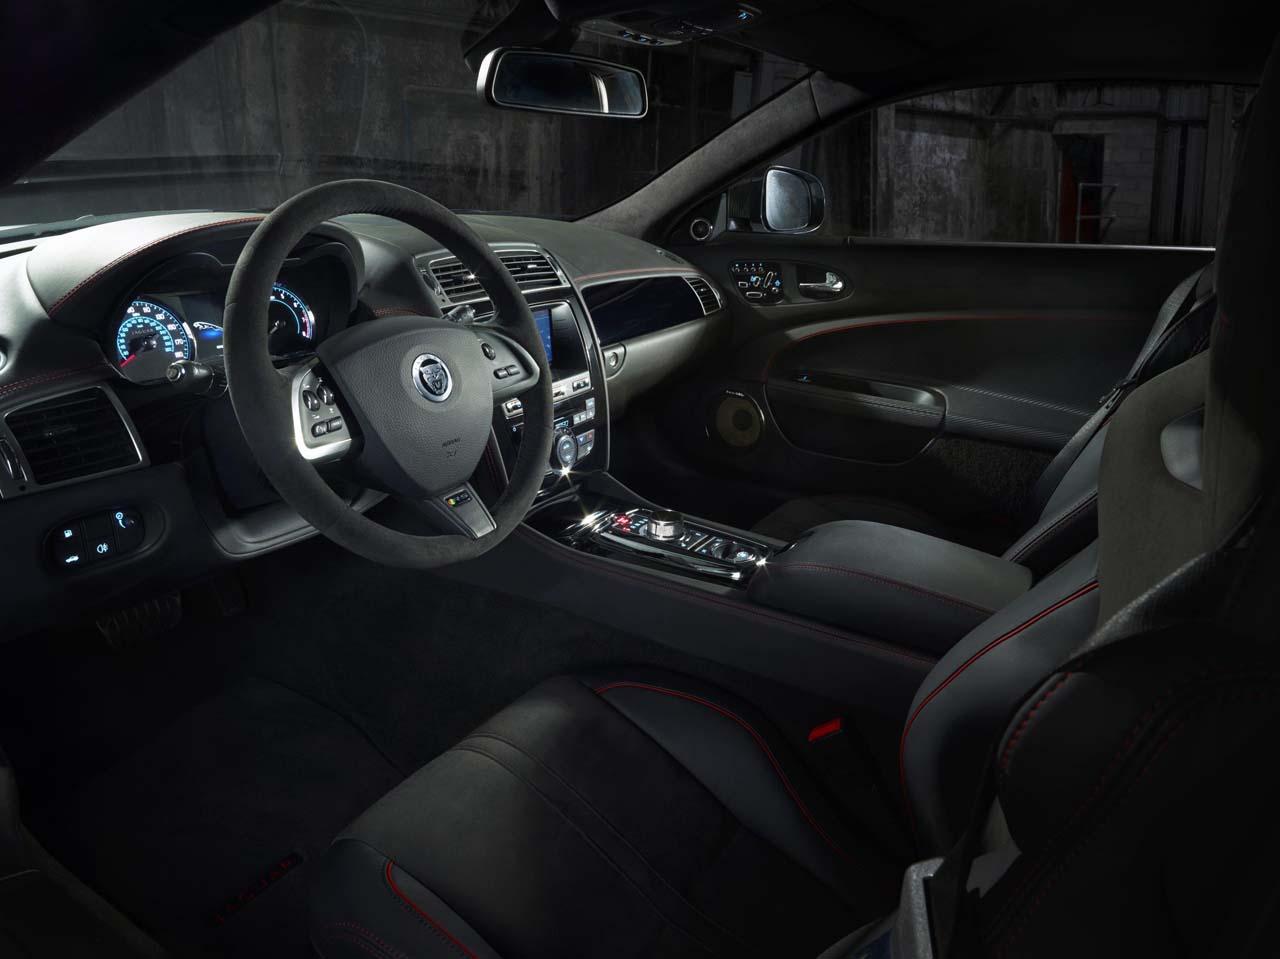 http://www.diseno-art.com/news_content/wp-content/uploads/2013/03/Jaguar-XKR-S-GT-13.jpg